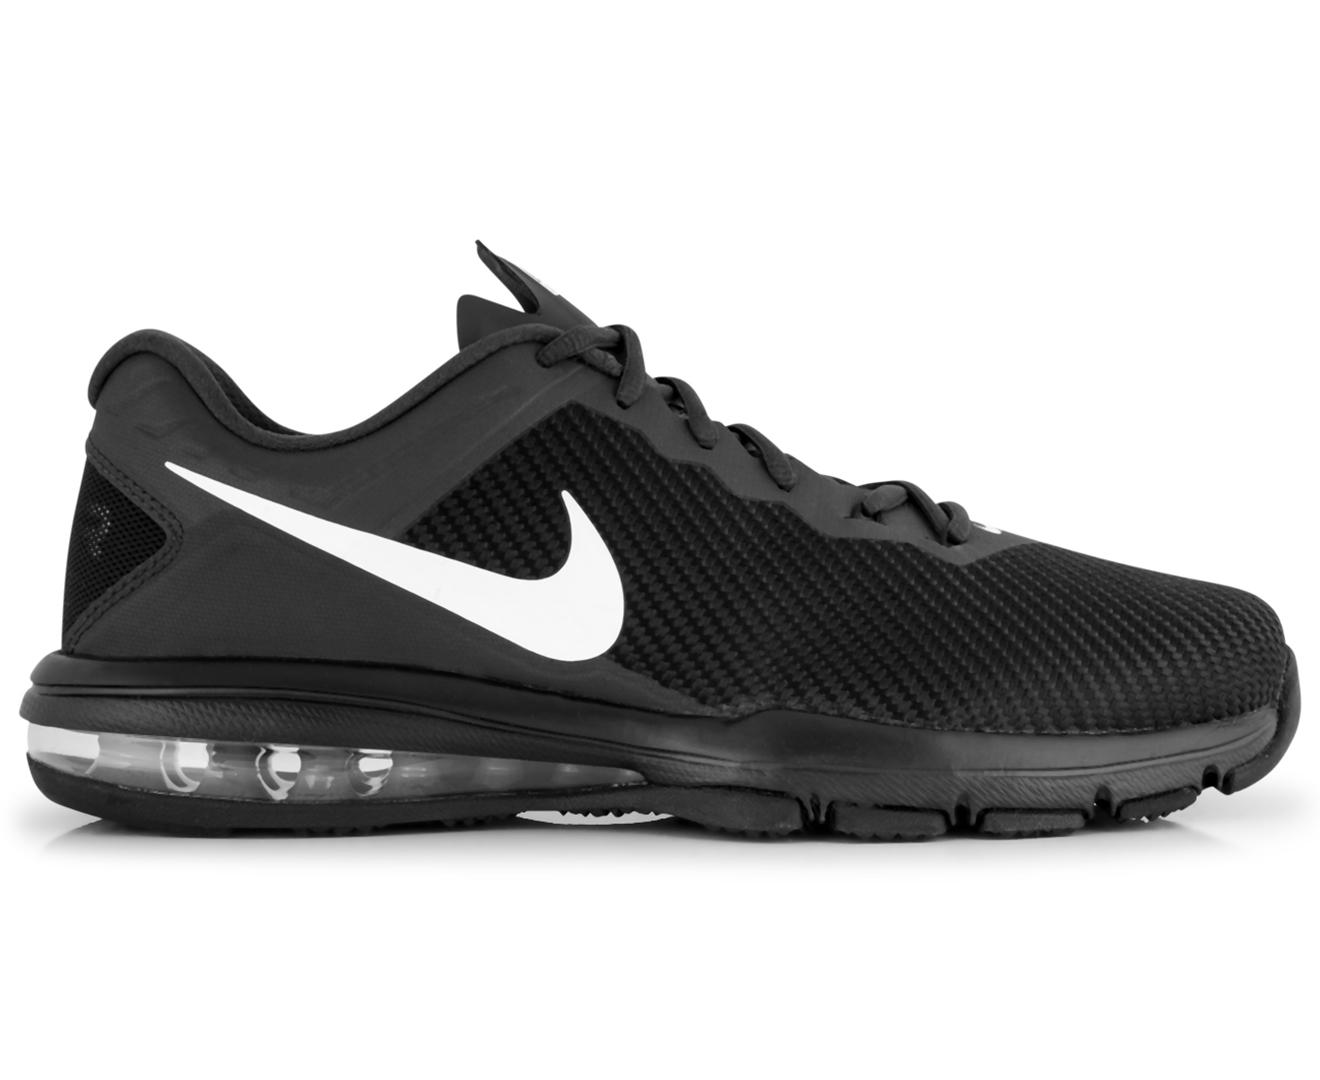 f80d5ac61d268 Nike Men'sAir Max Full Ride TR 1.5 Shoe - Black/White-Anthracite